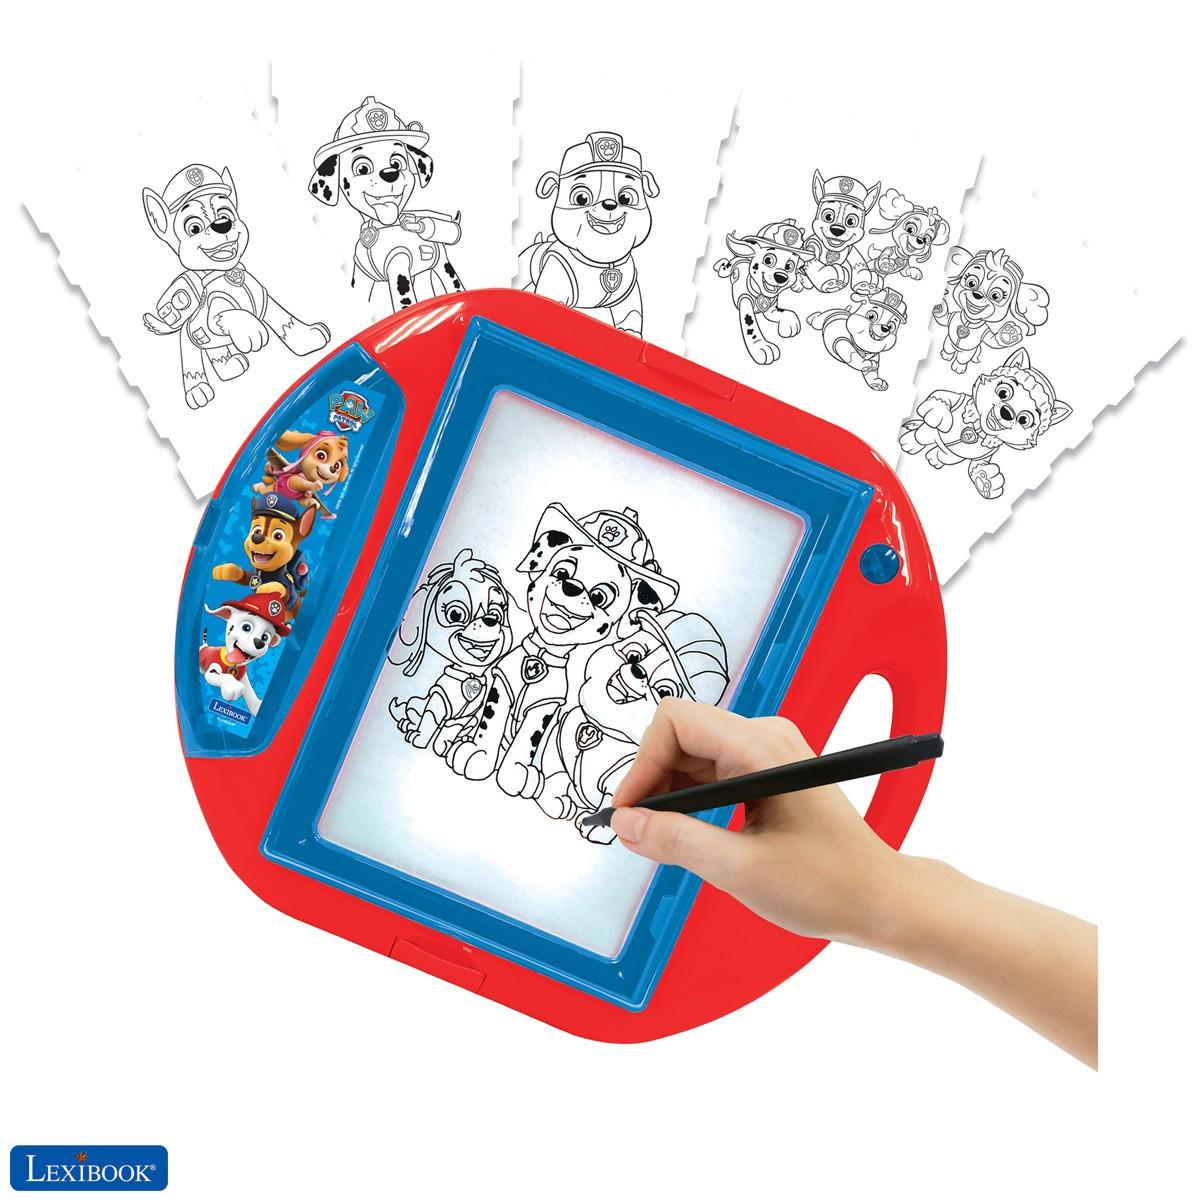 Paw Patrol Drawing Projector